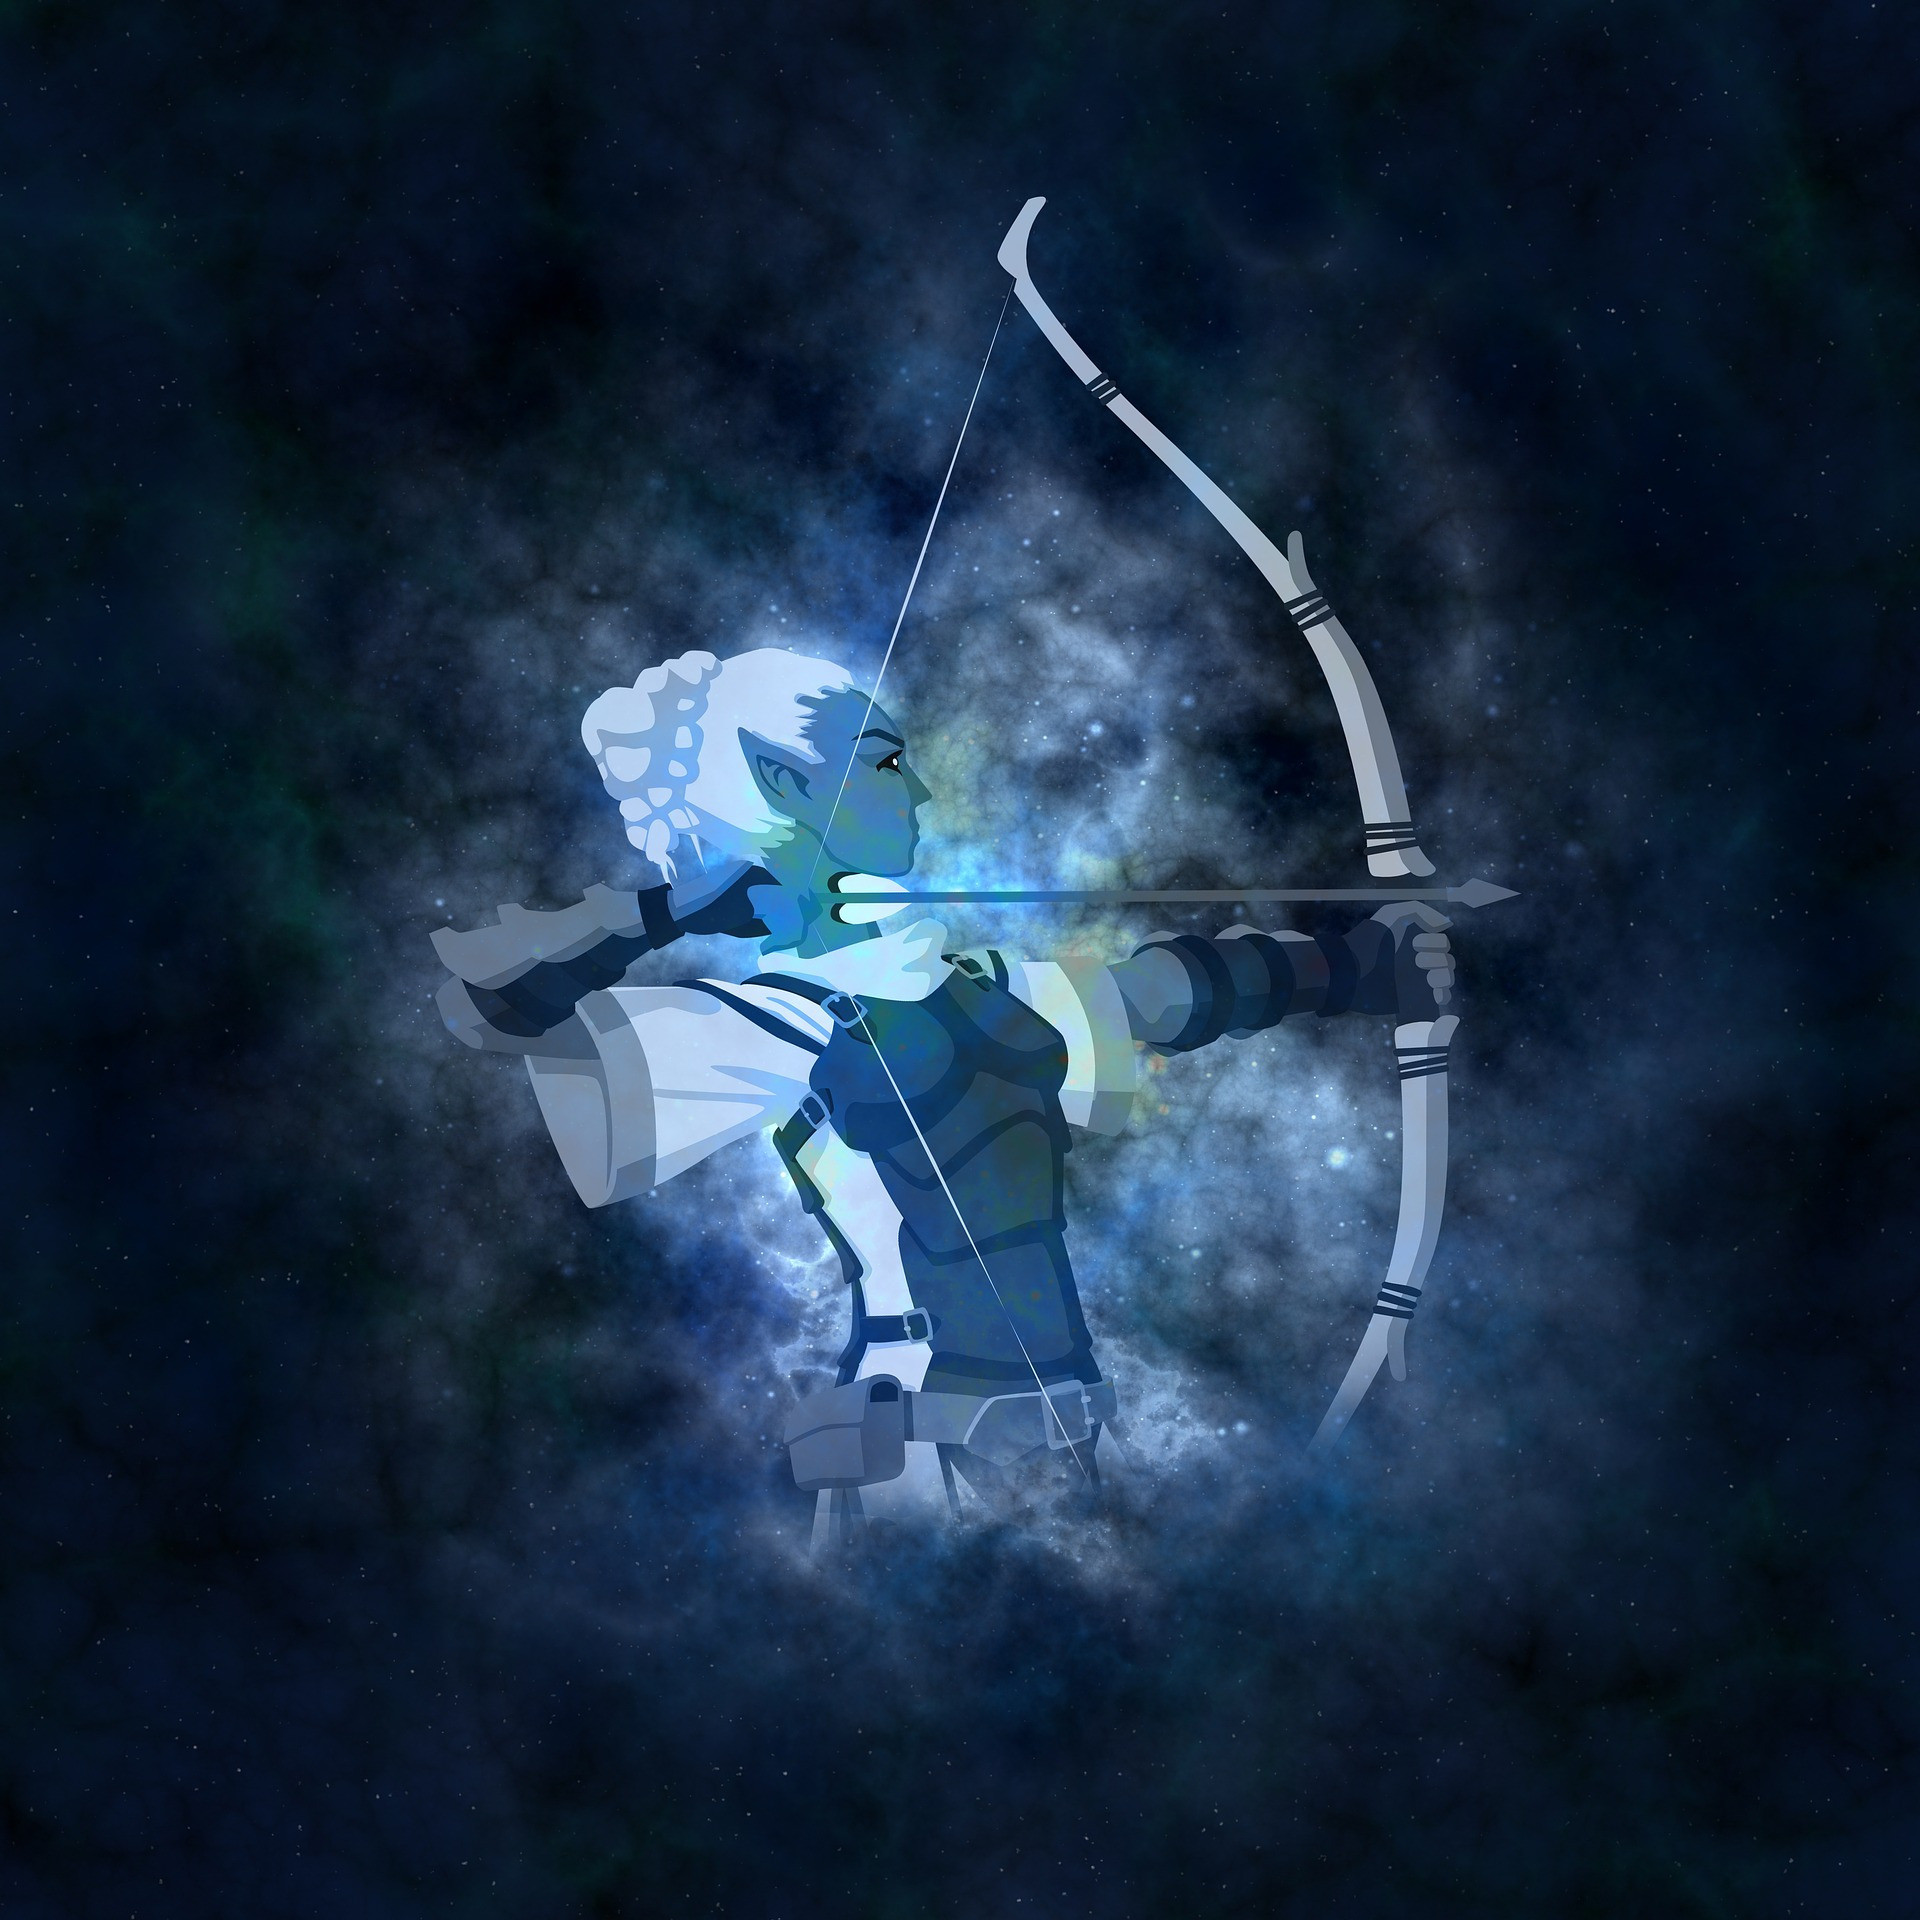 Овен: совместимость с другими знаками зодиака